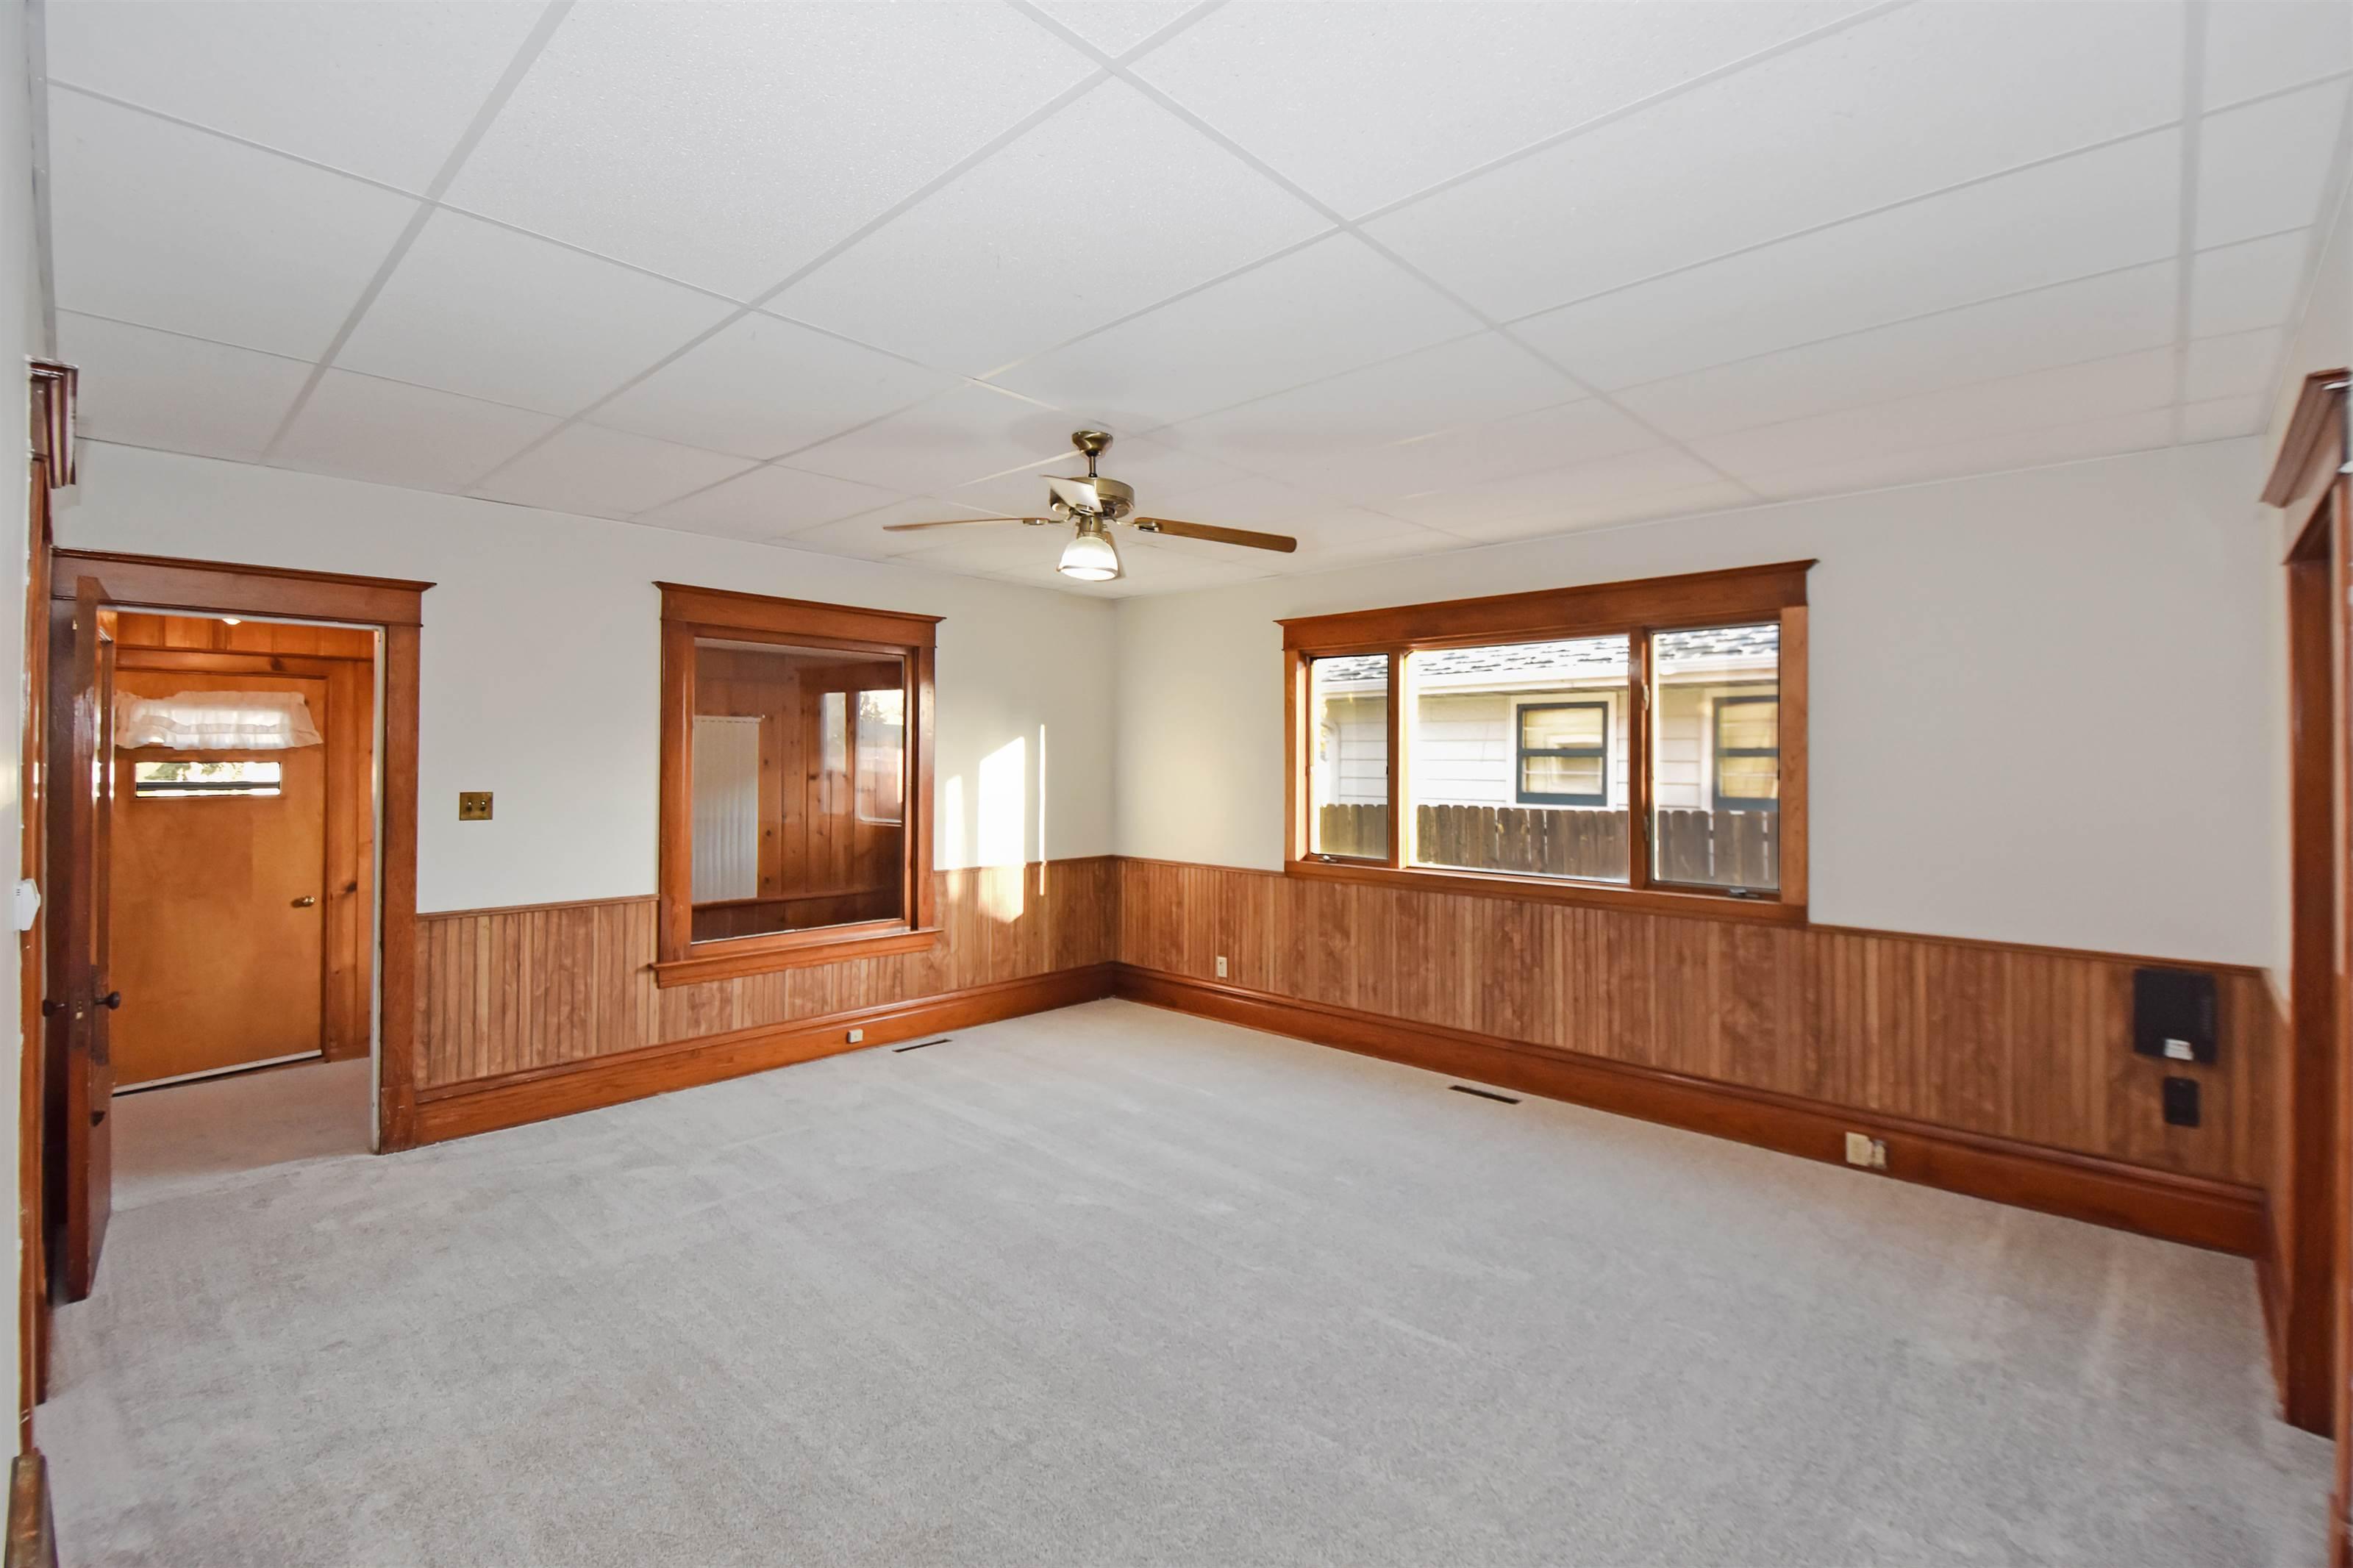 422 Main St, Tioga, ND 58852